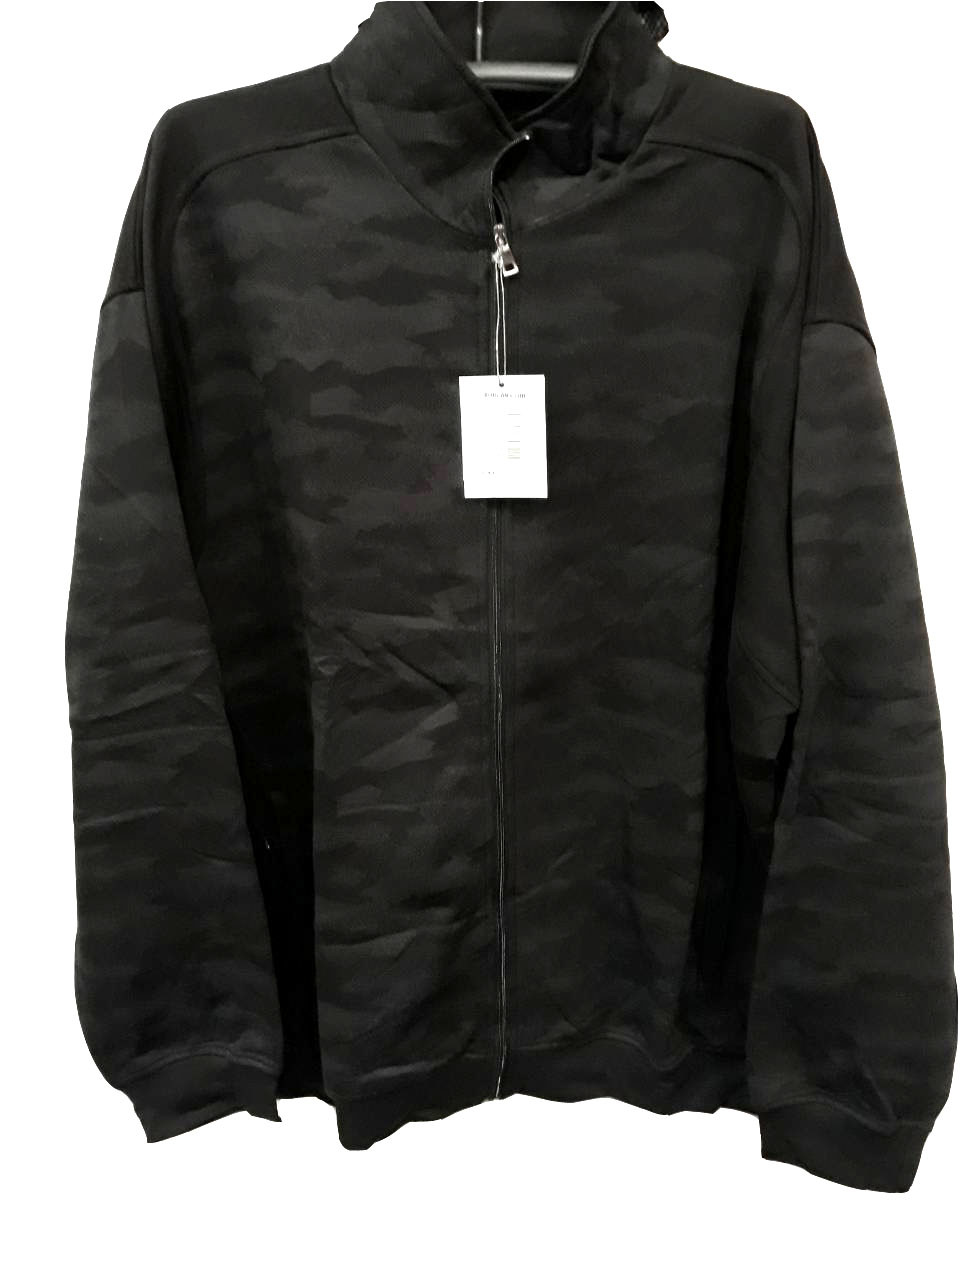 Кофта супер батал мужская на молнии Borgan Club теплая Серый камуфляж без капюшона